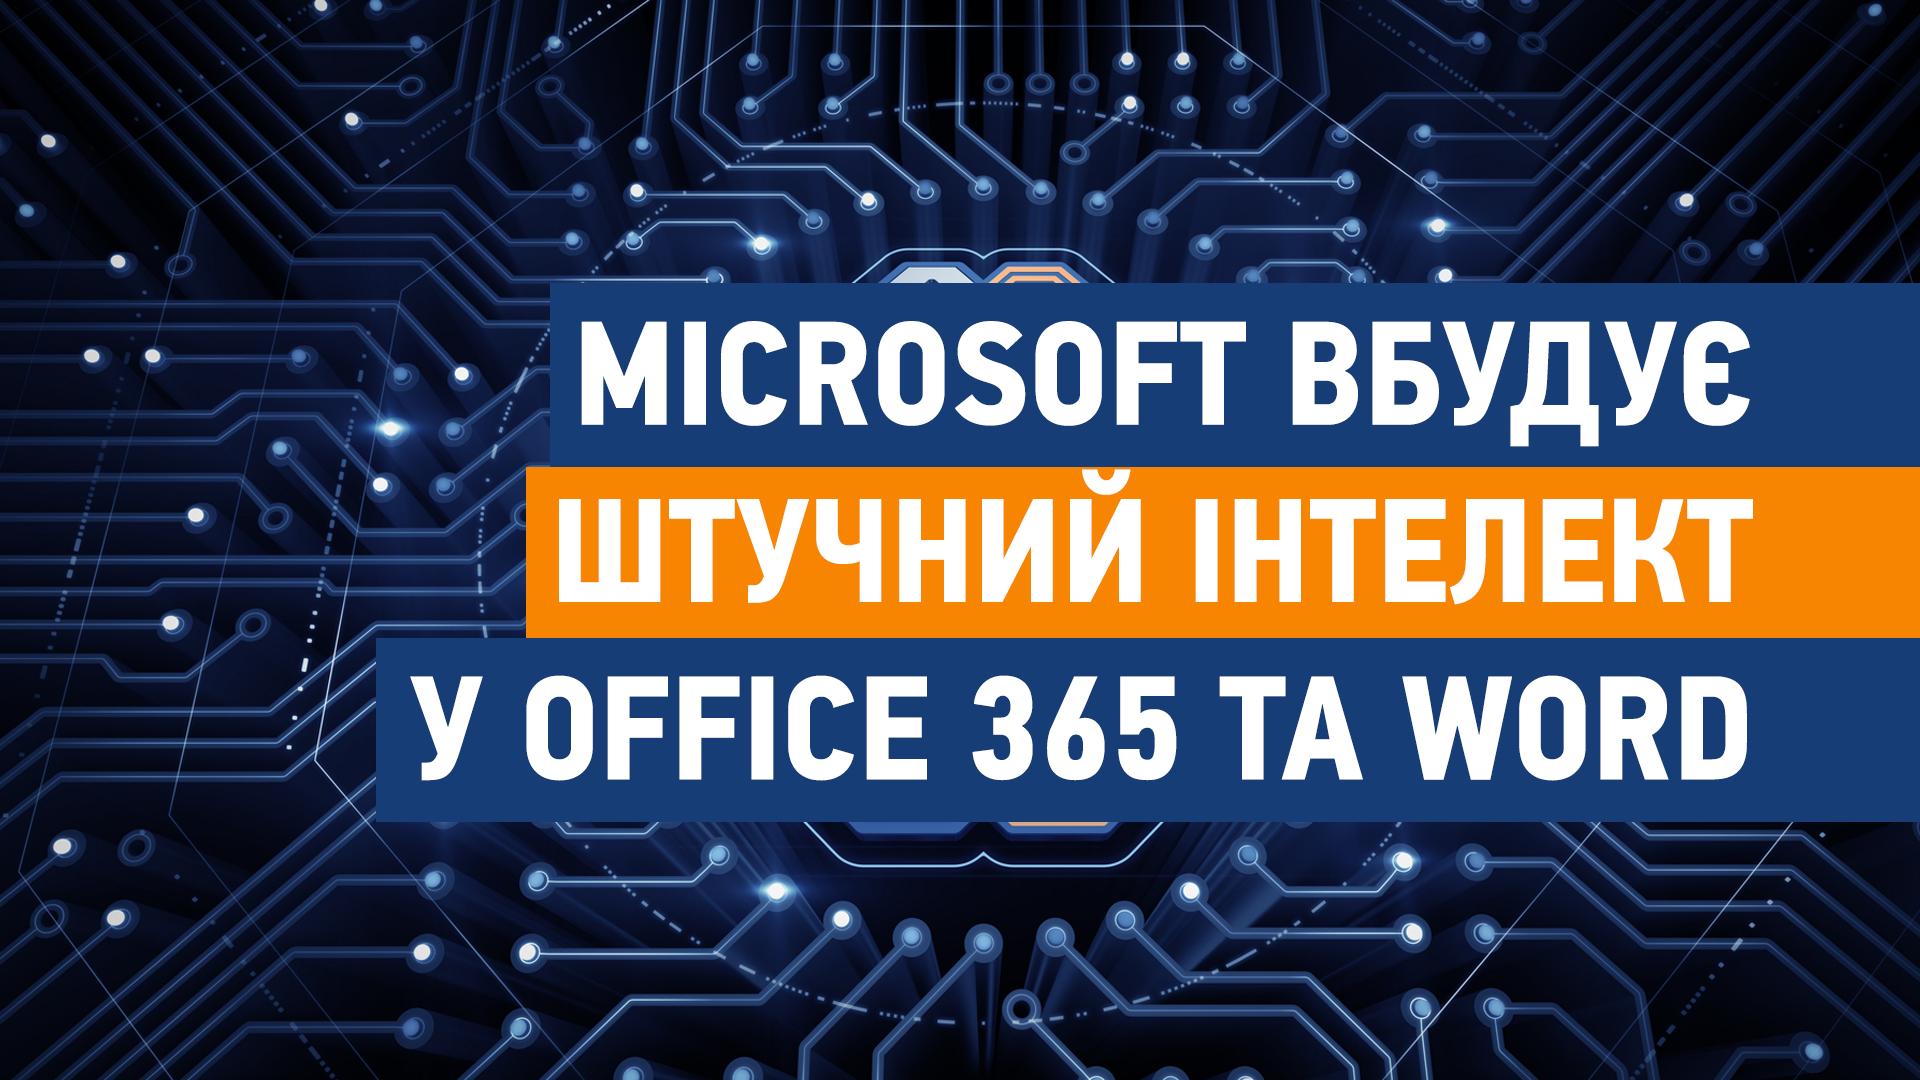 Microsoft вбудує штучний інтелект в Office Word - Microsoft - AI Microsoft Word poglyad 1